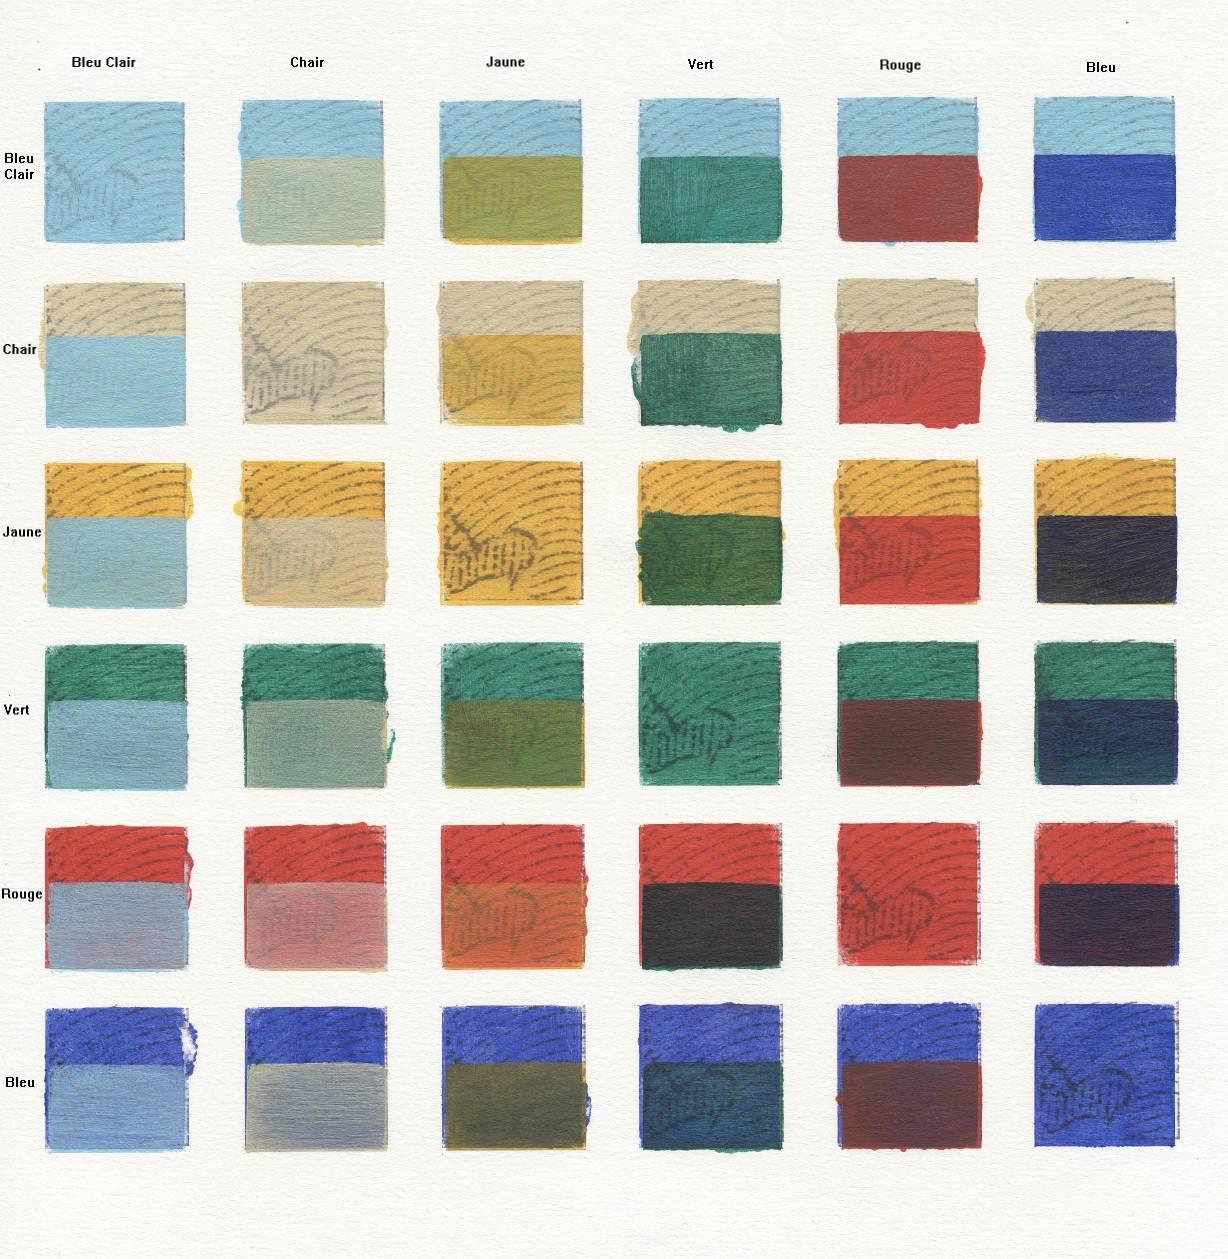 http://mapage.noos.fr/pic-vert/forum/palette.jpg